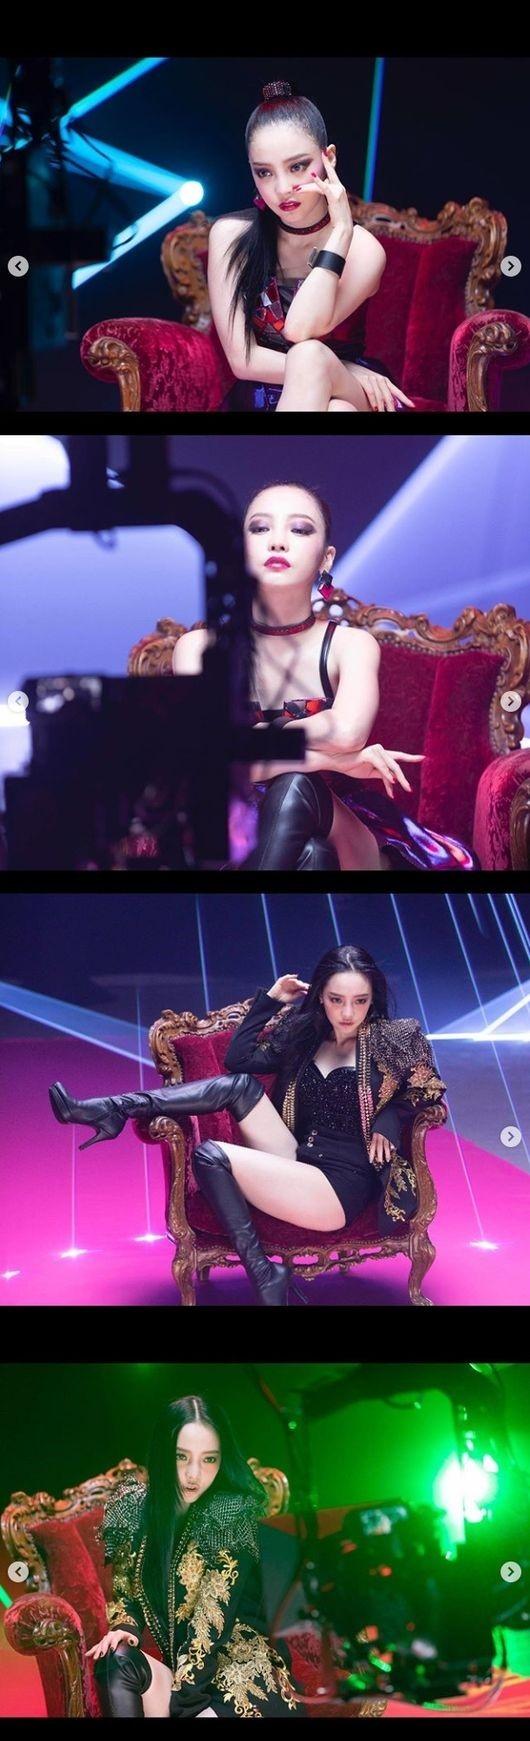 KARA出身的具荷拉《Midnight Queen》音乐MV的B片段公开 性感的魅力